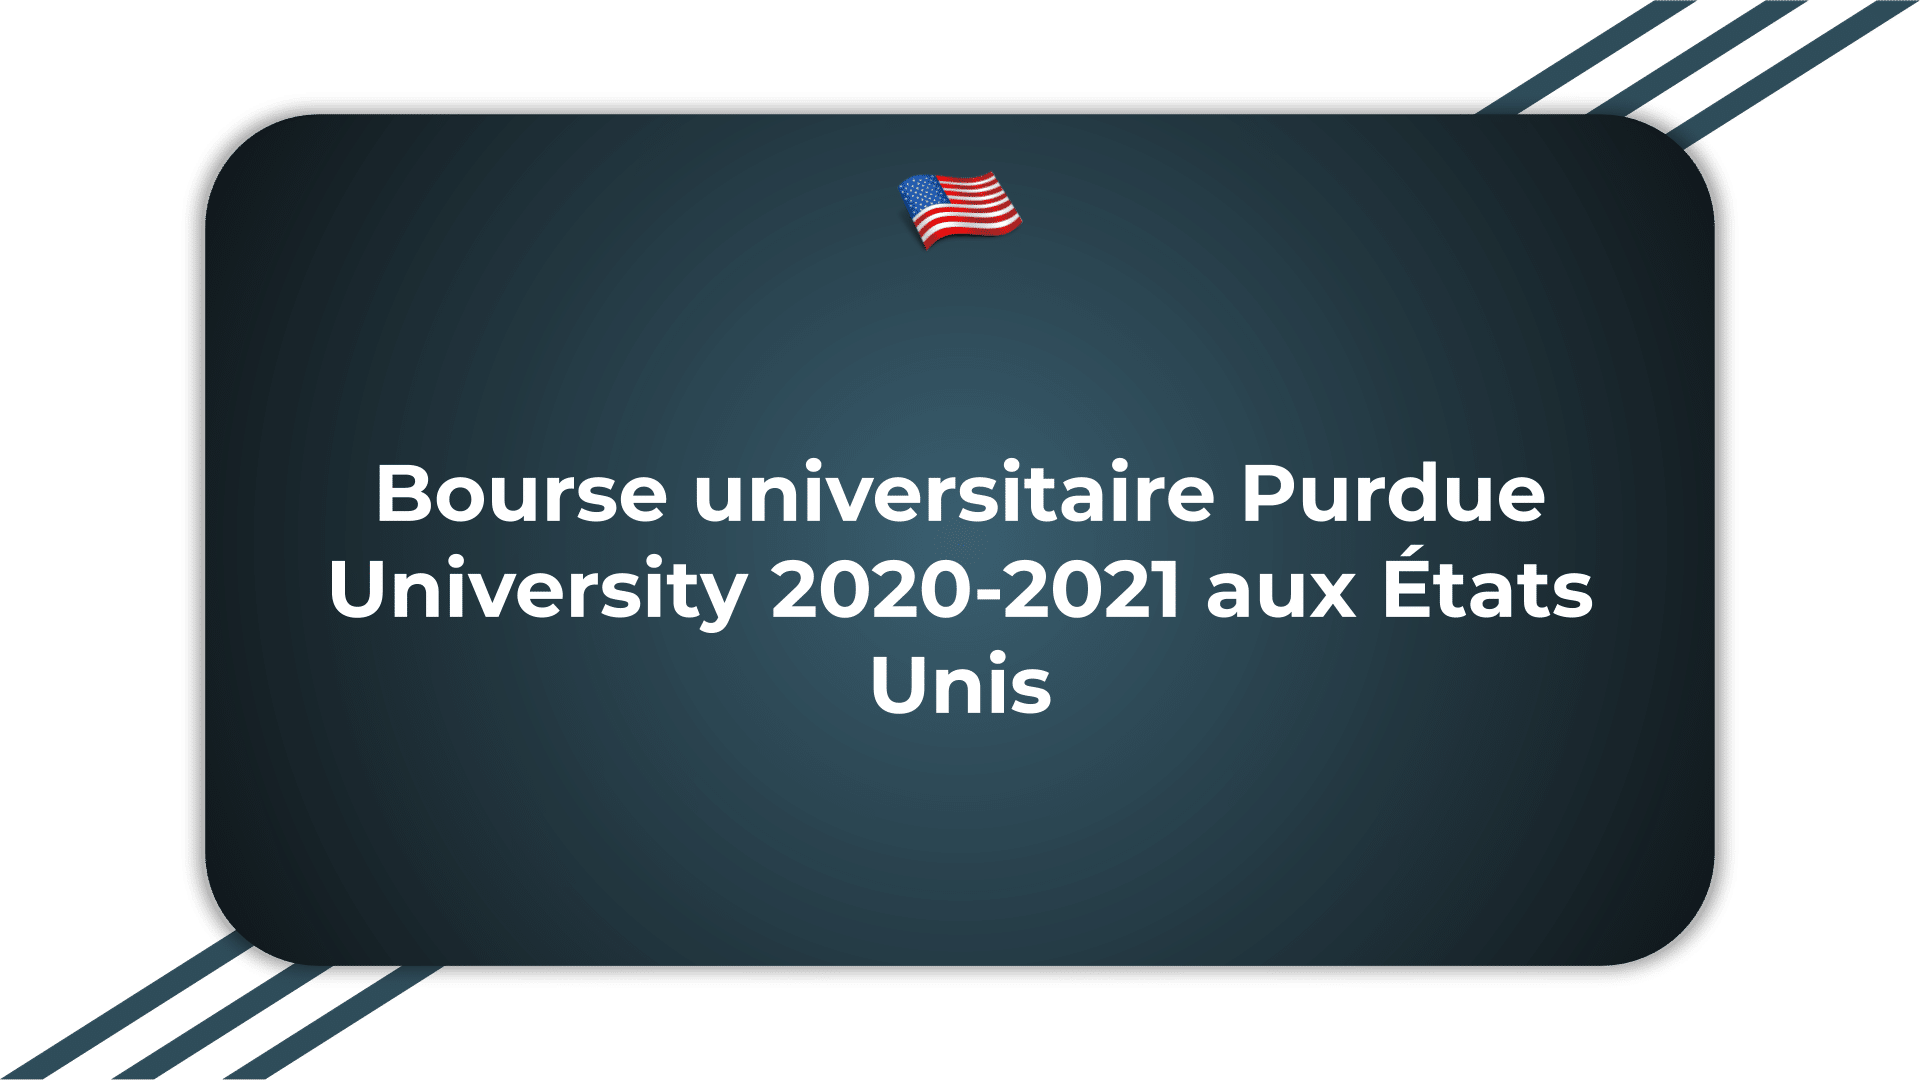 Bourse universitaire Purdue University